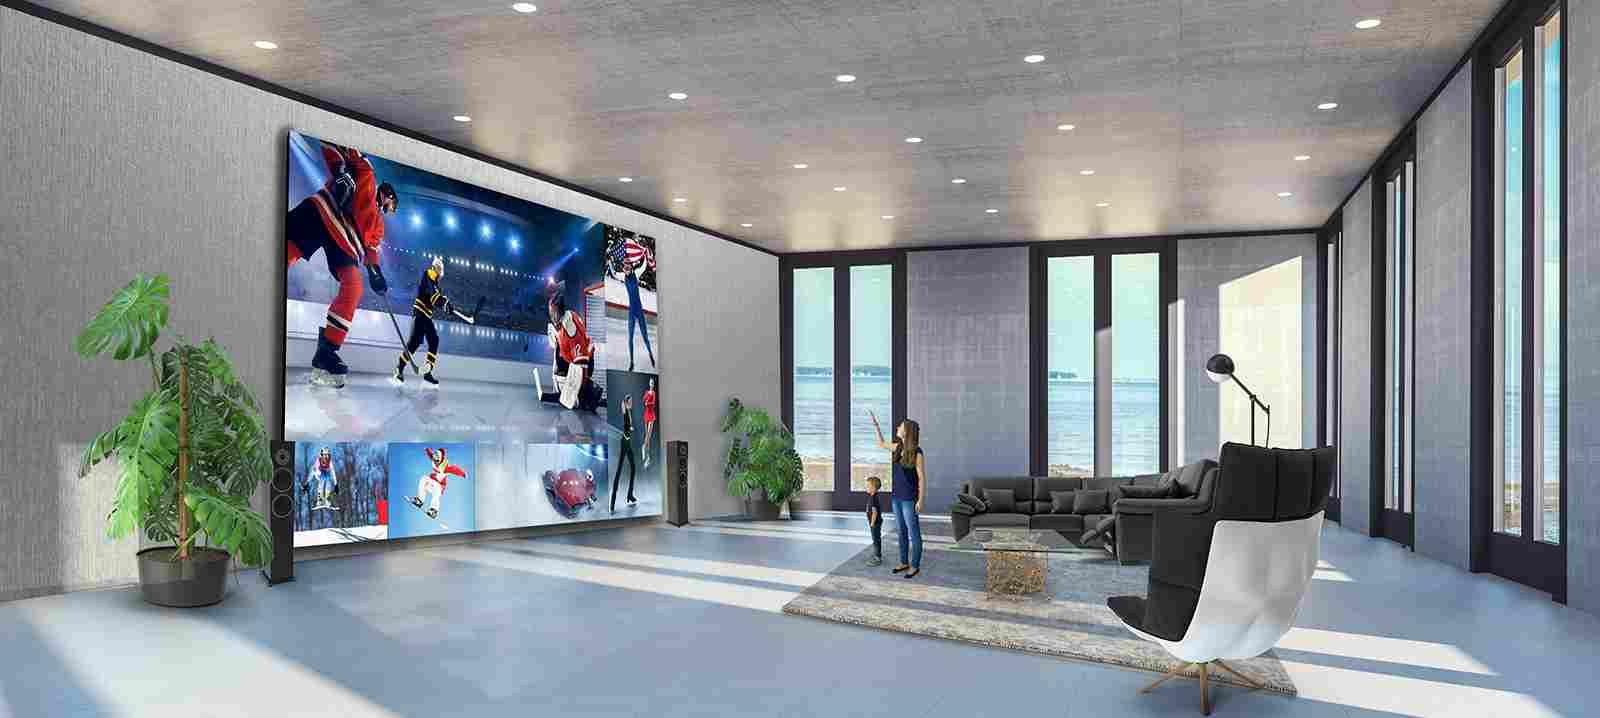 LG, la mastodontica tv grande quanto una parete (LG)